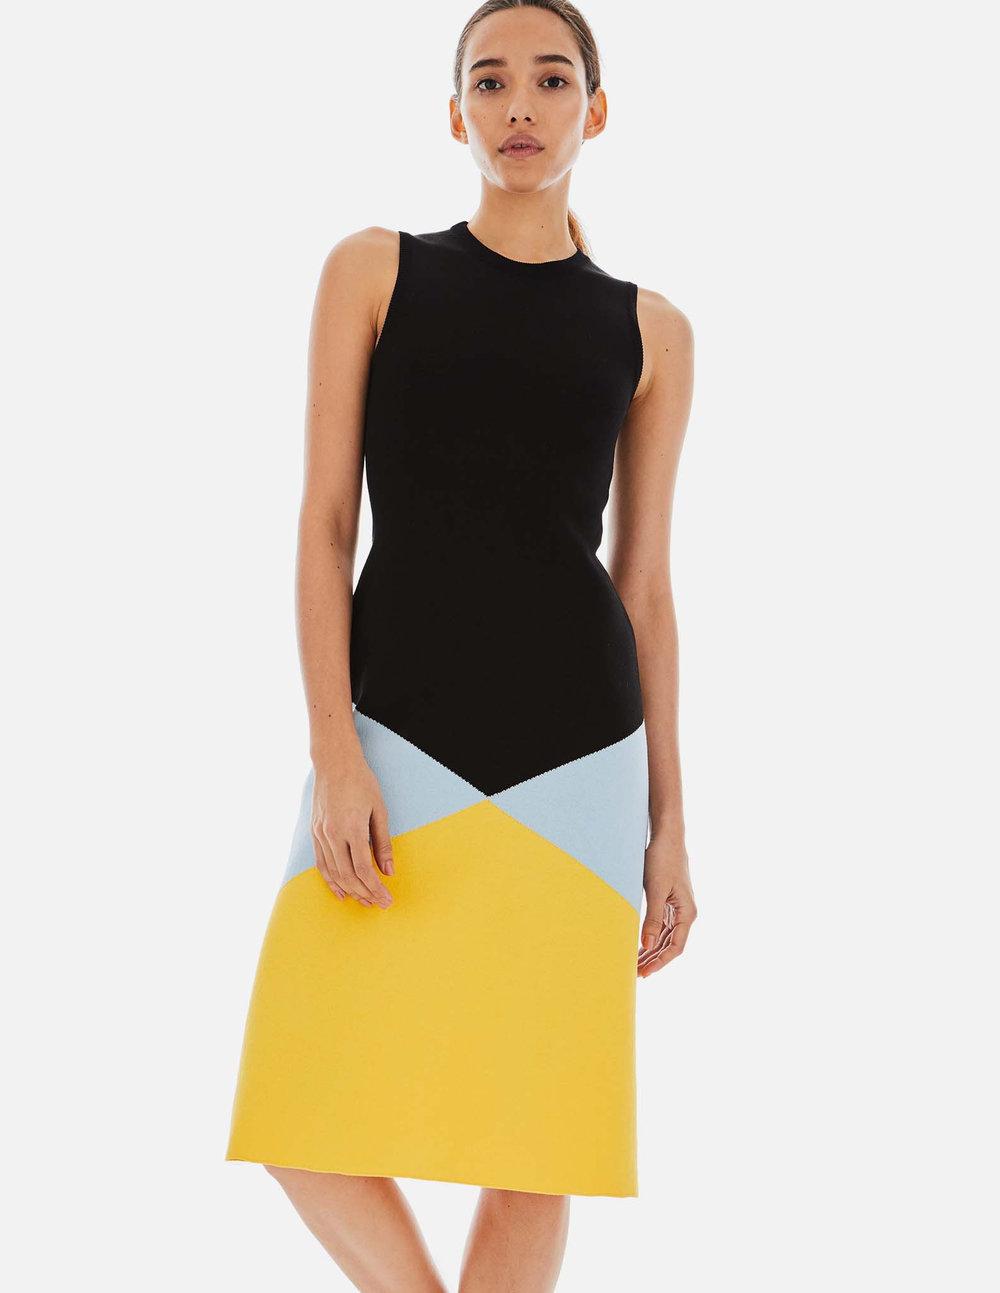 Novis - Taconic Sleeveless Dress